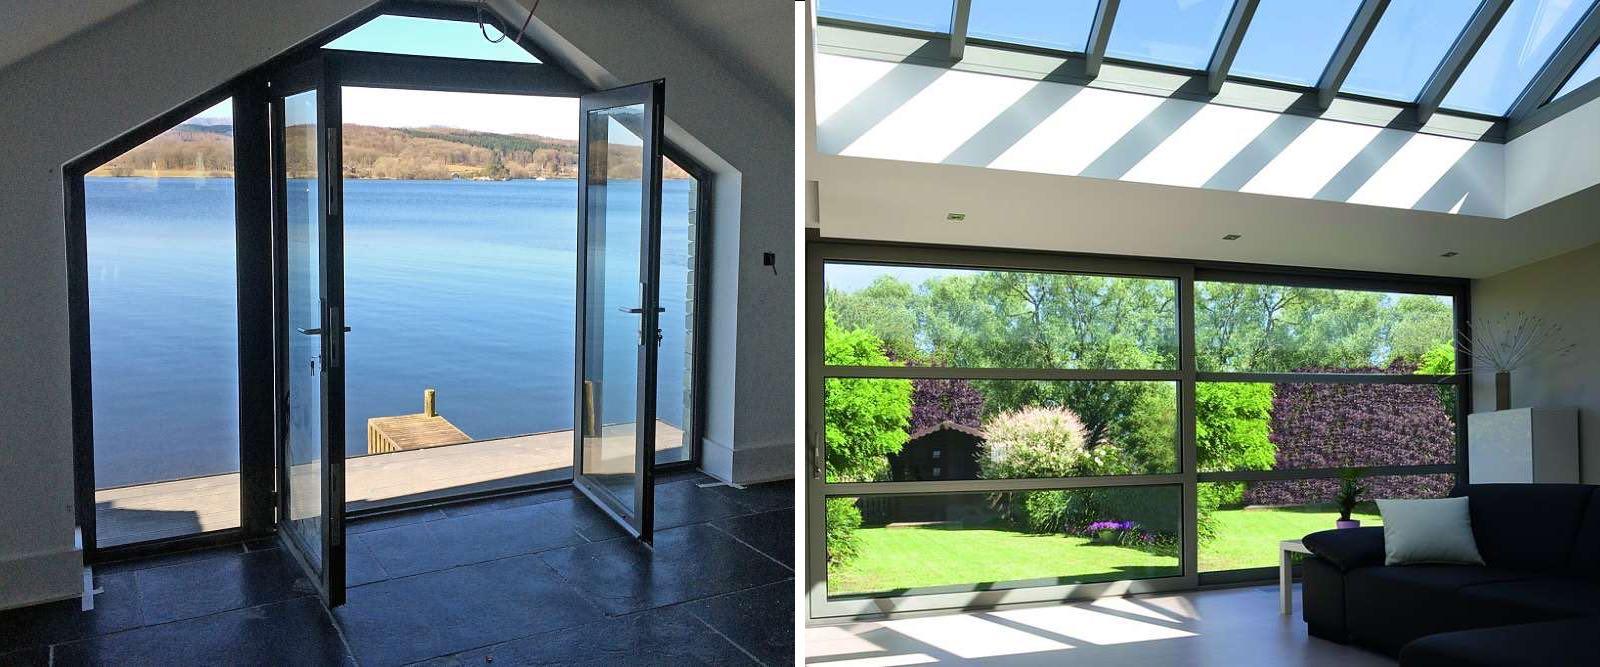 Contemporary Windows Smart Window Systems Marlin